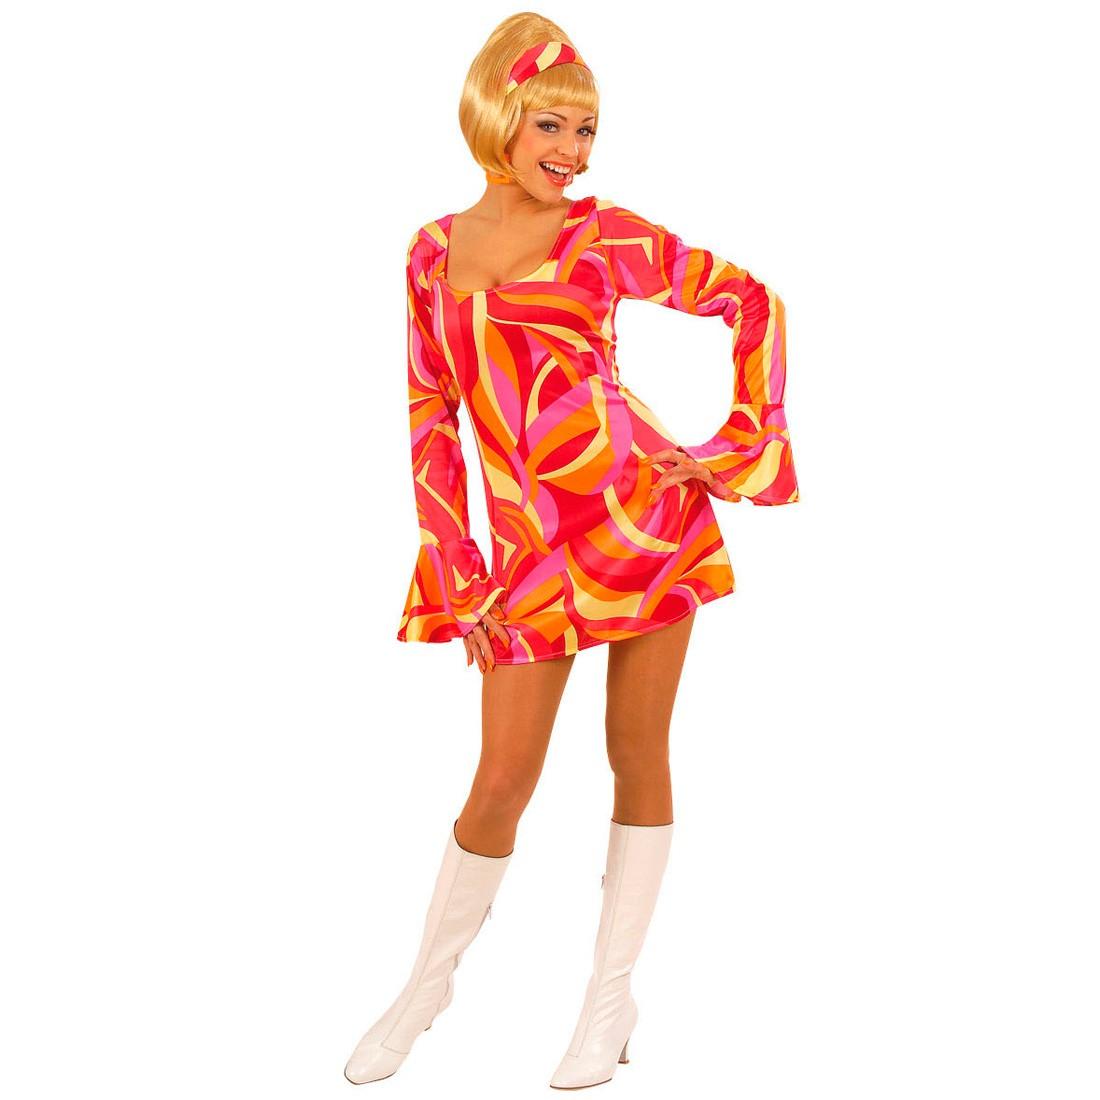 90er Party Outfit Herren 60er 70er Jahre Outfit Damen Hippie